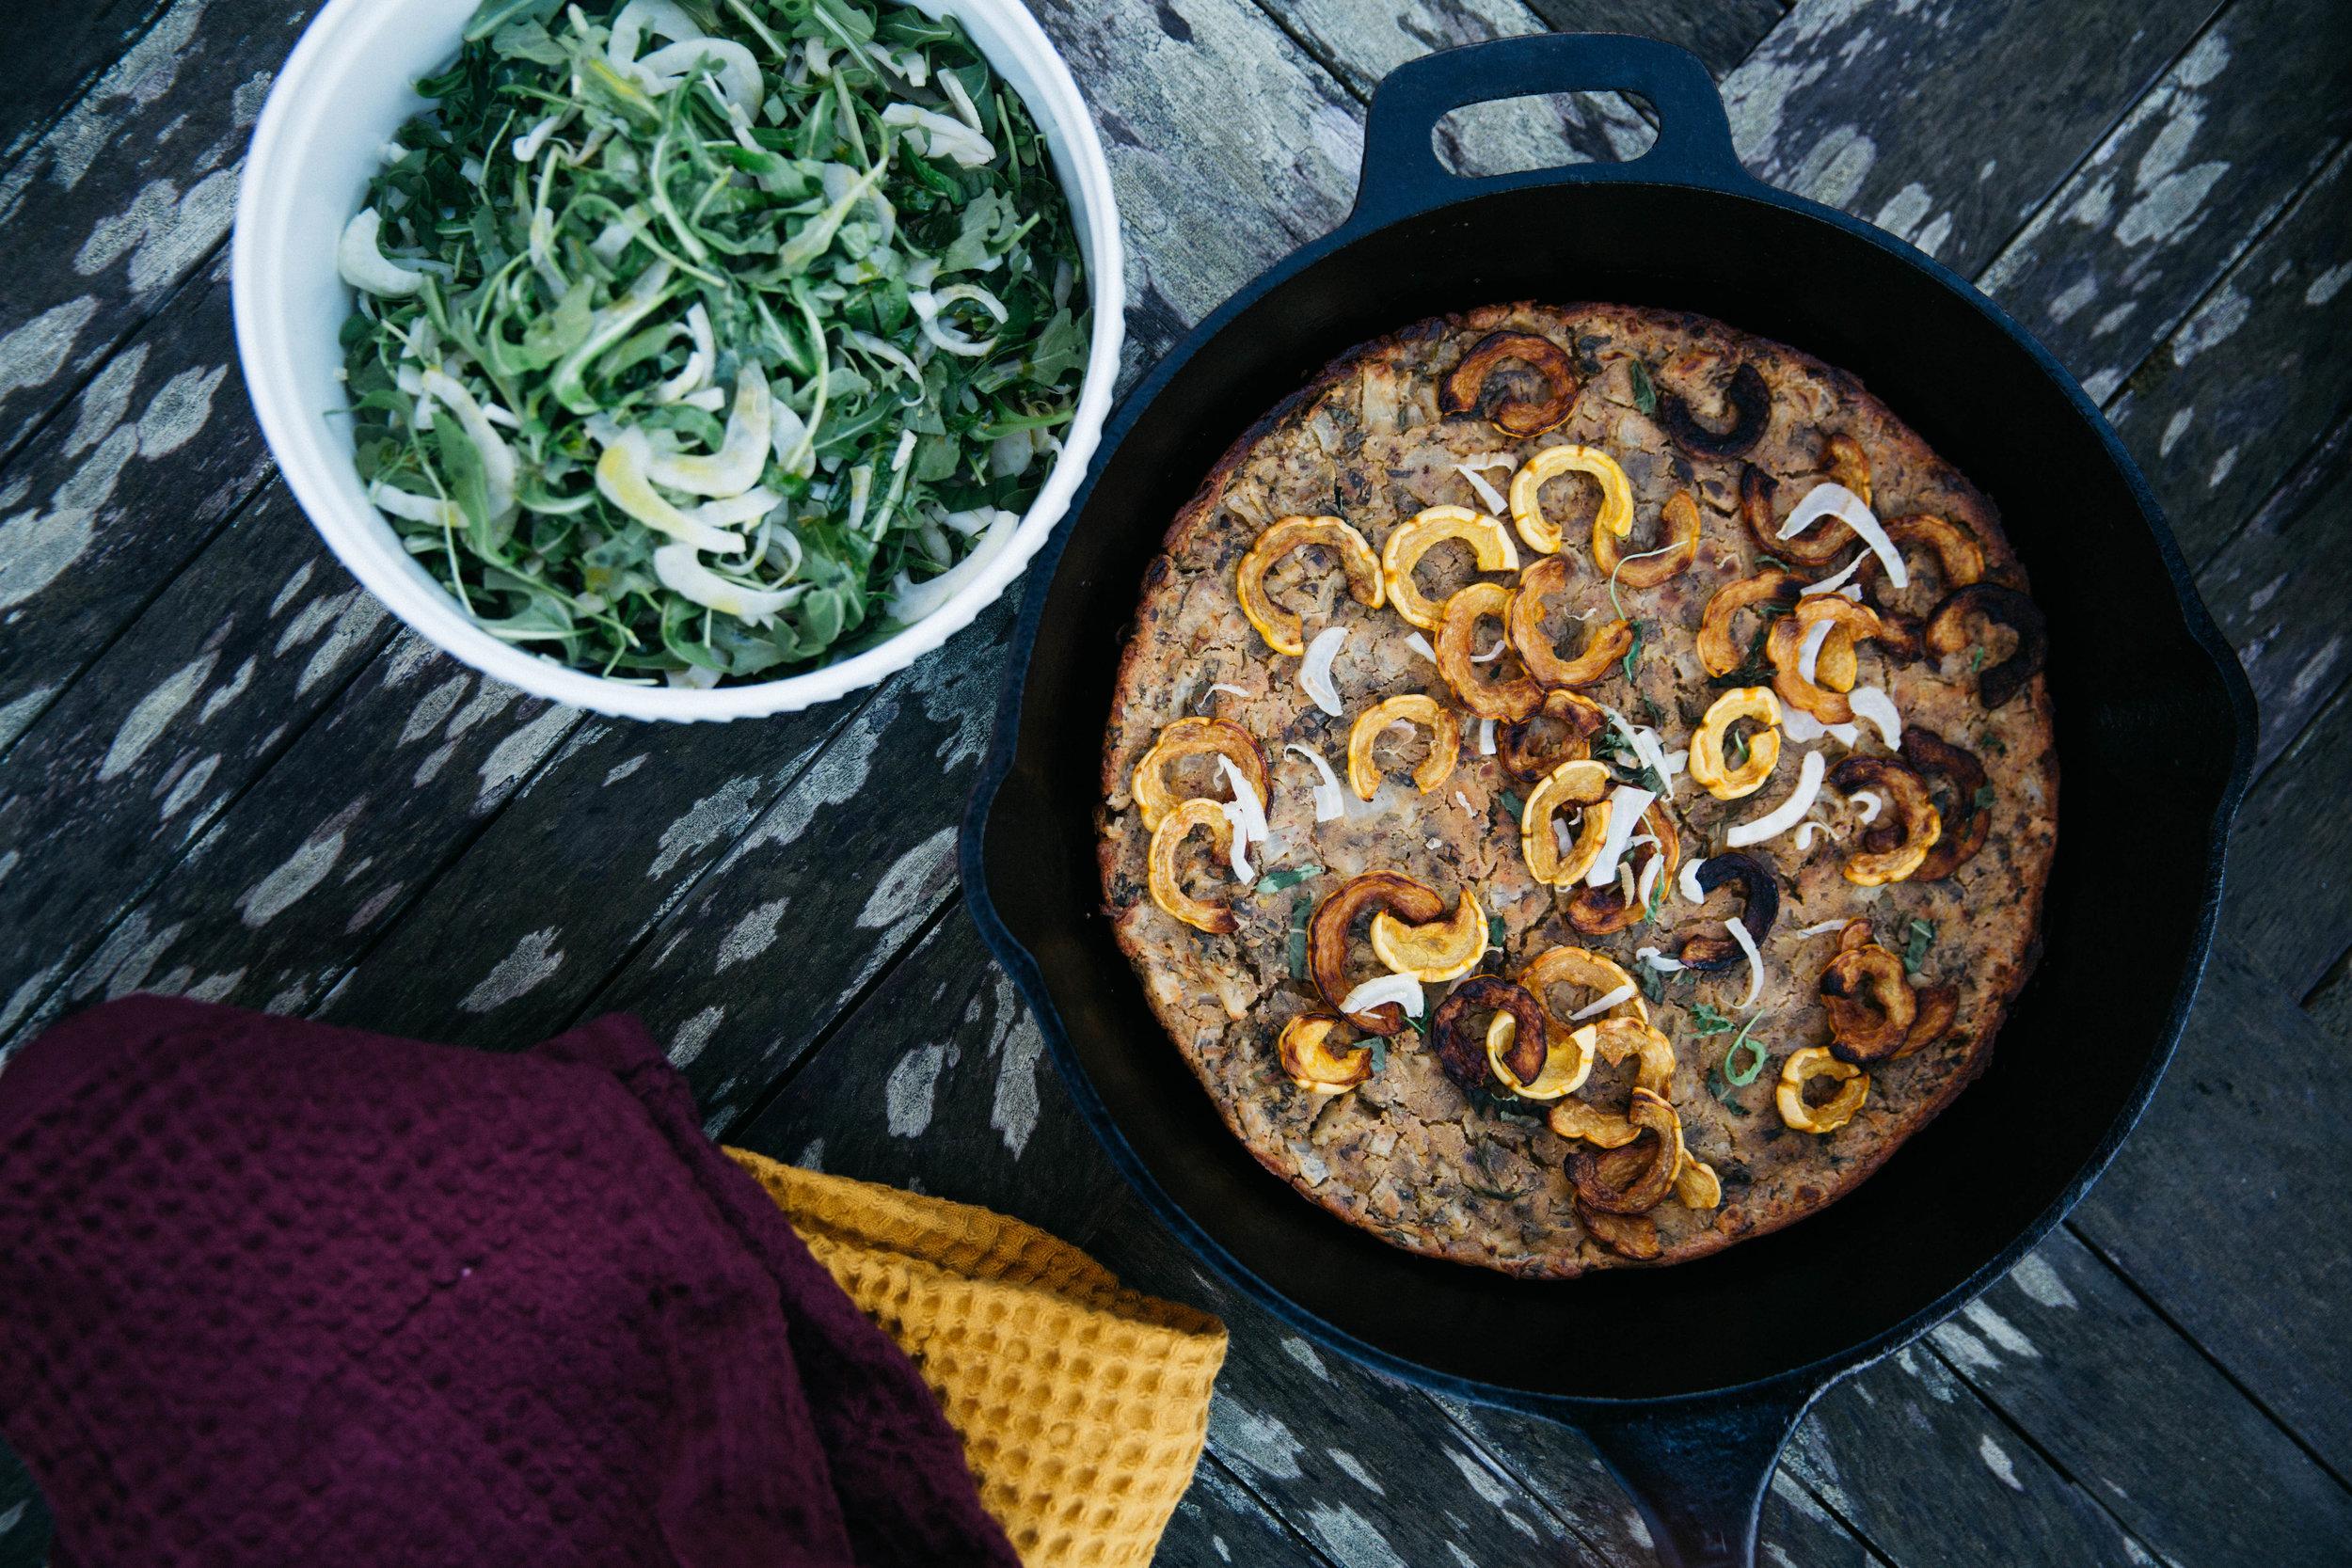 sumac socca recipe-12.jpg